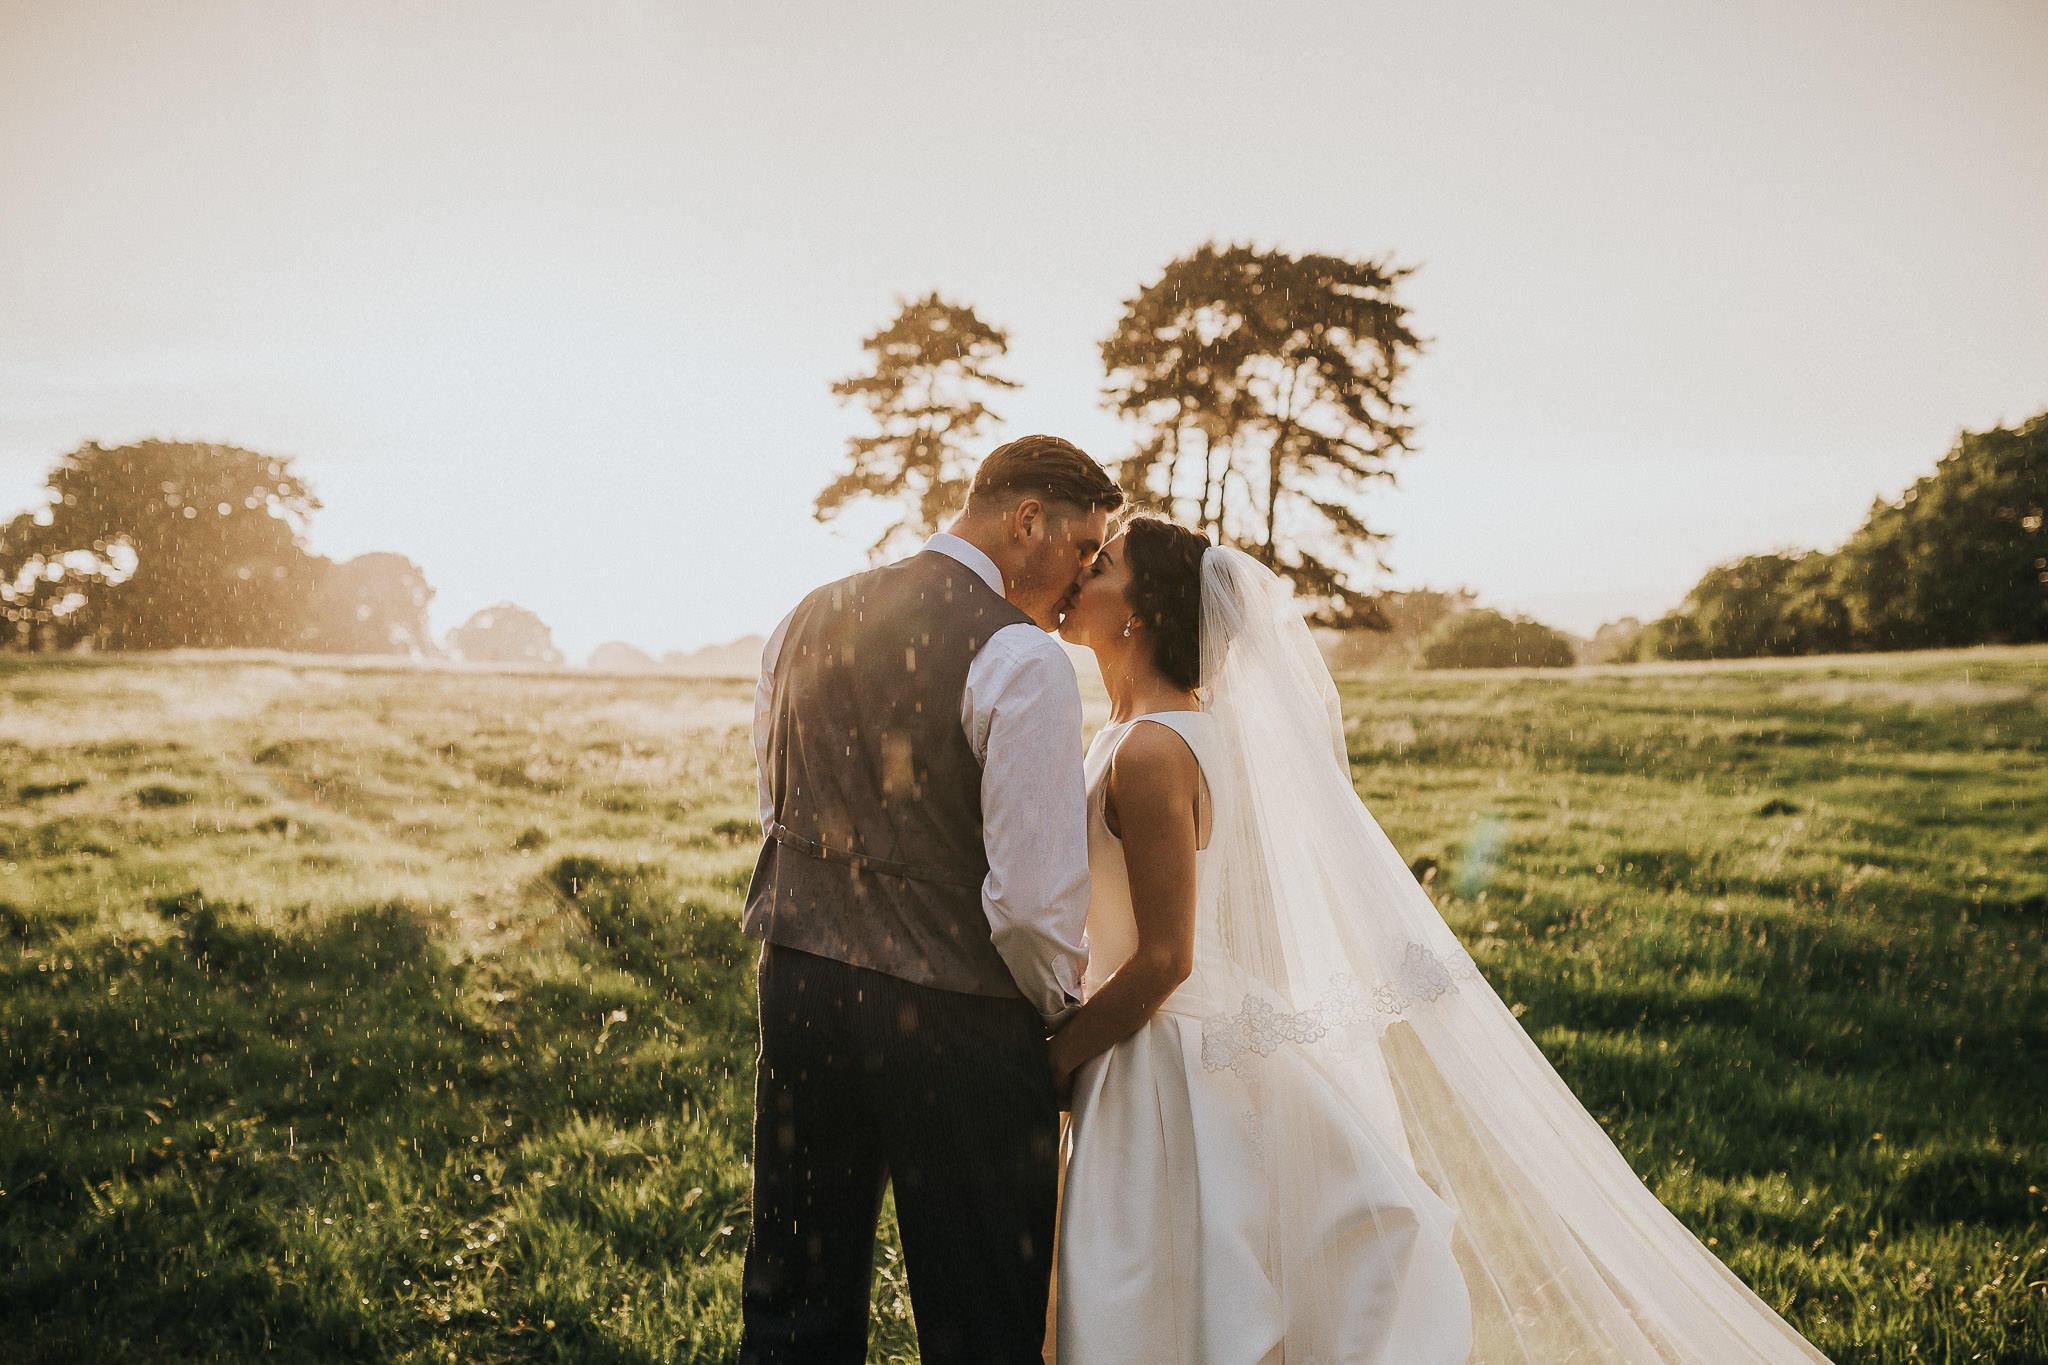 Staffordshire-Wedding-Photographer-147.jpg